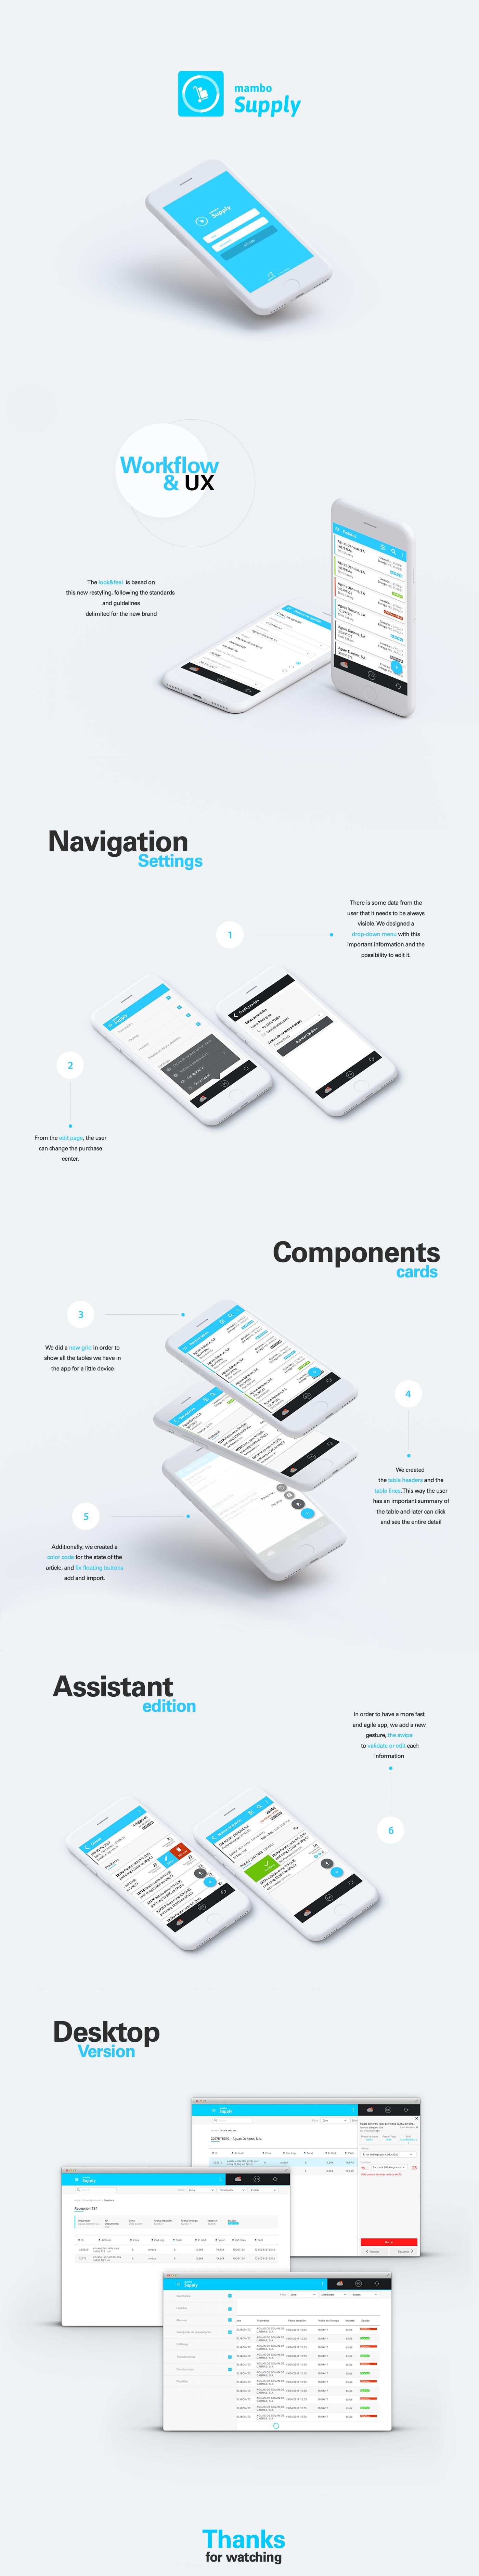 UI ux movil app Interface tablet design interactive Web menu